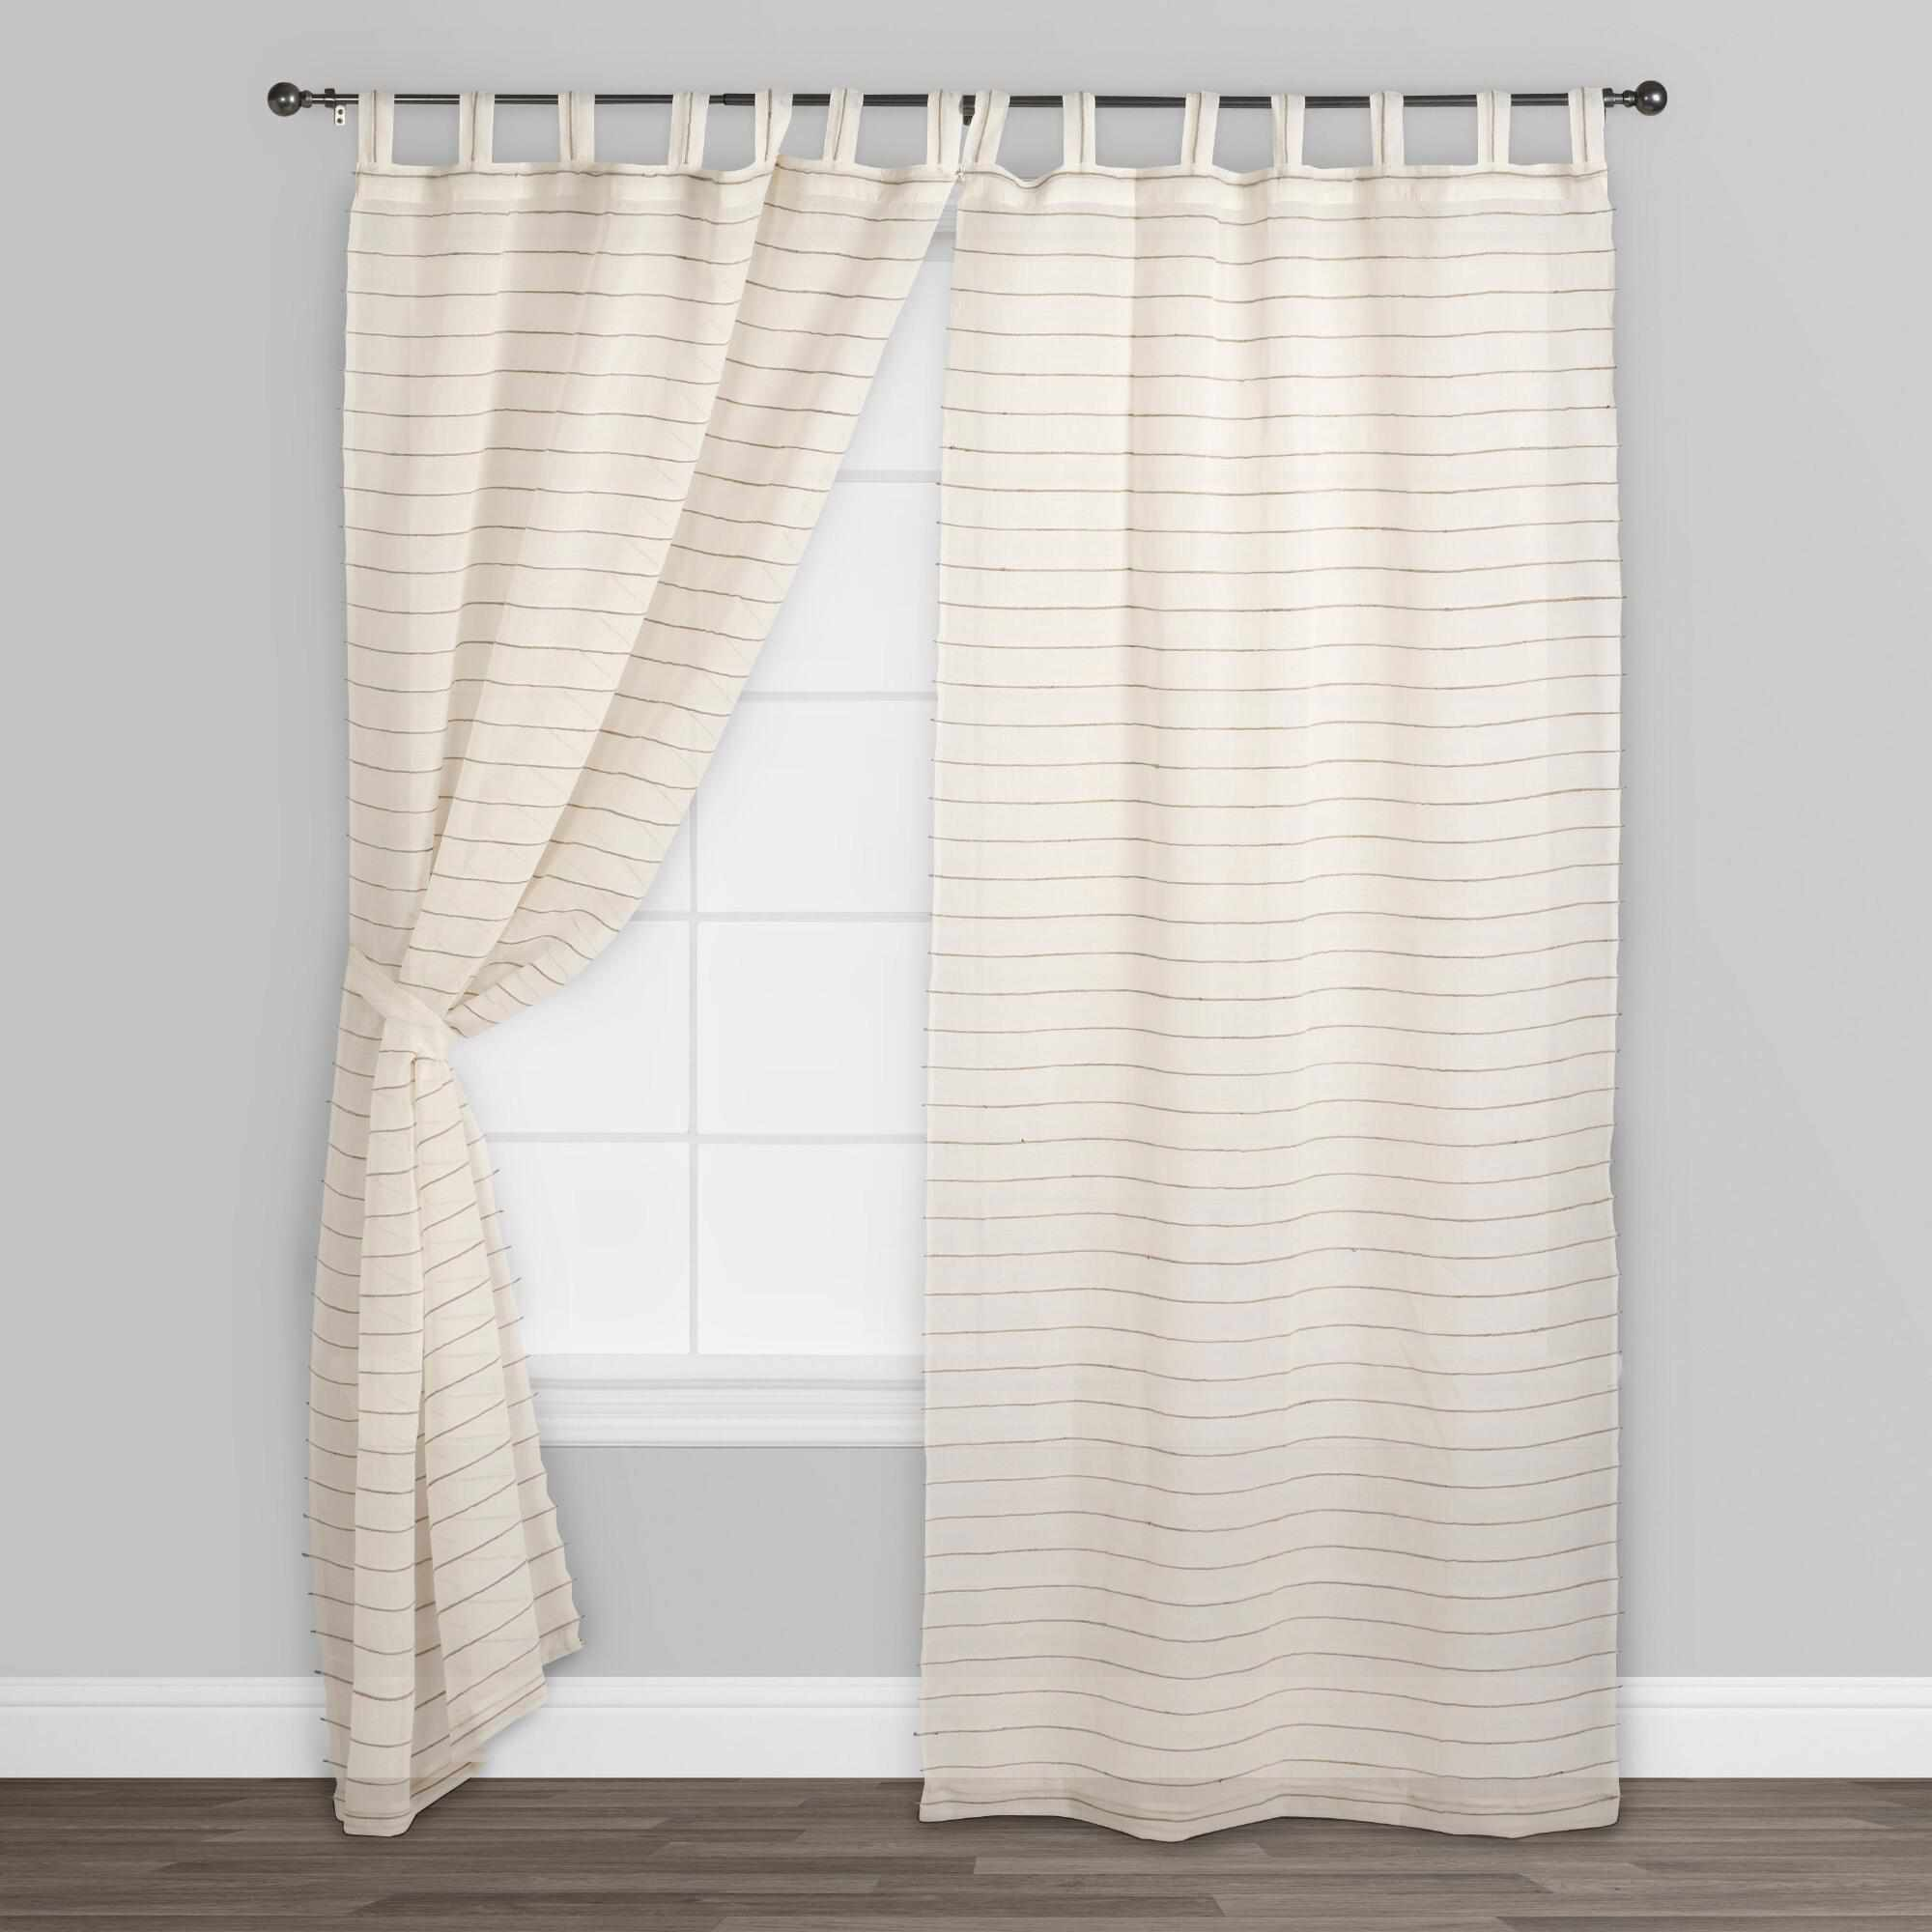 World Market Ivory Jute Striped Sahaj Tab Top Curtains